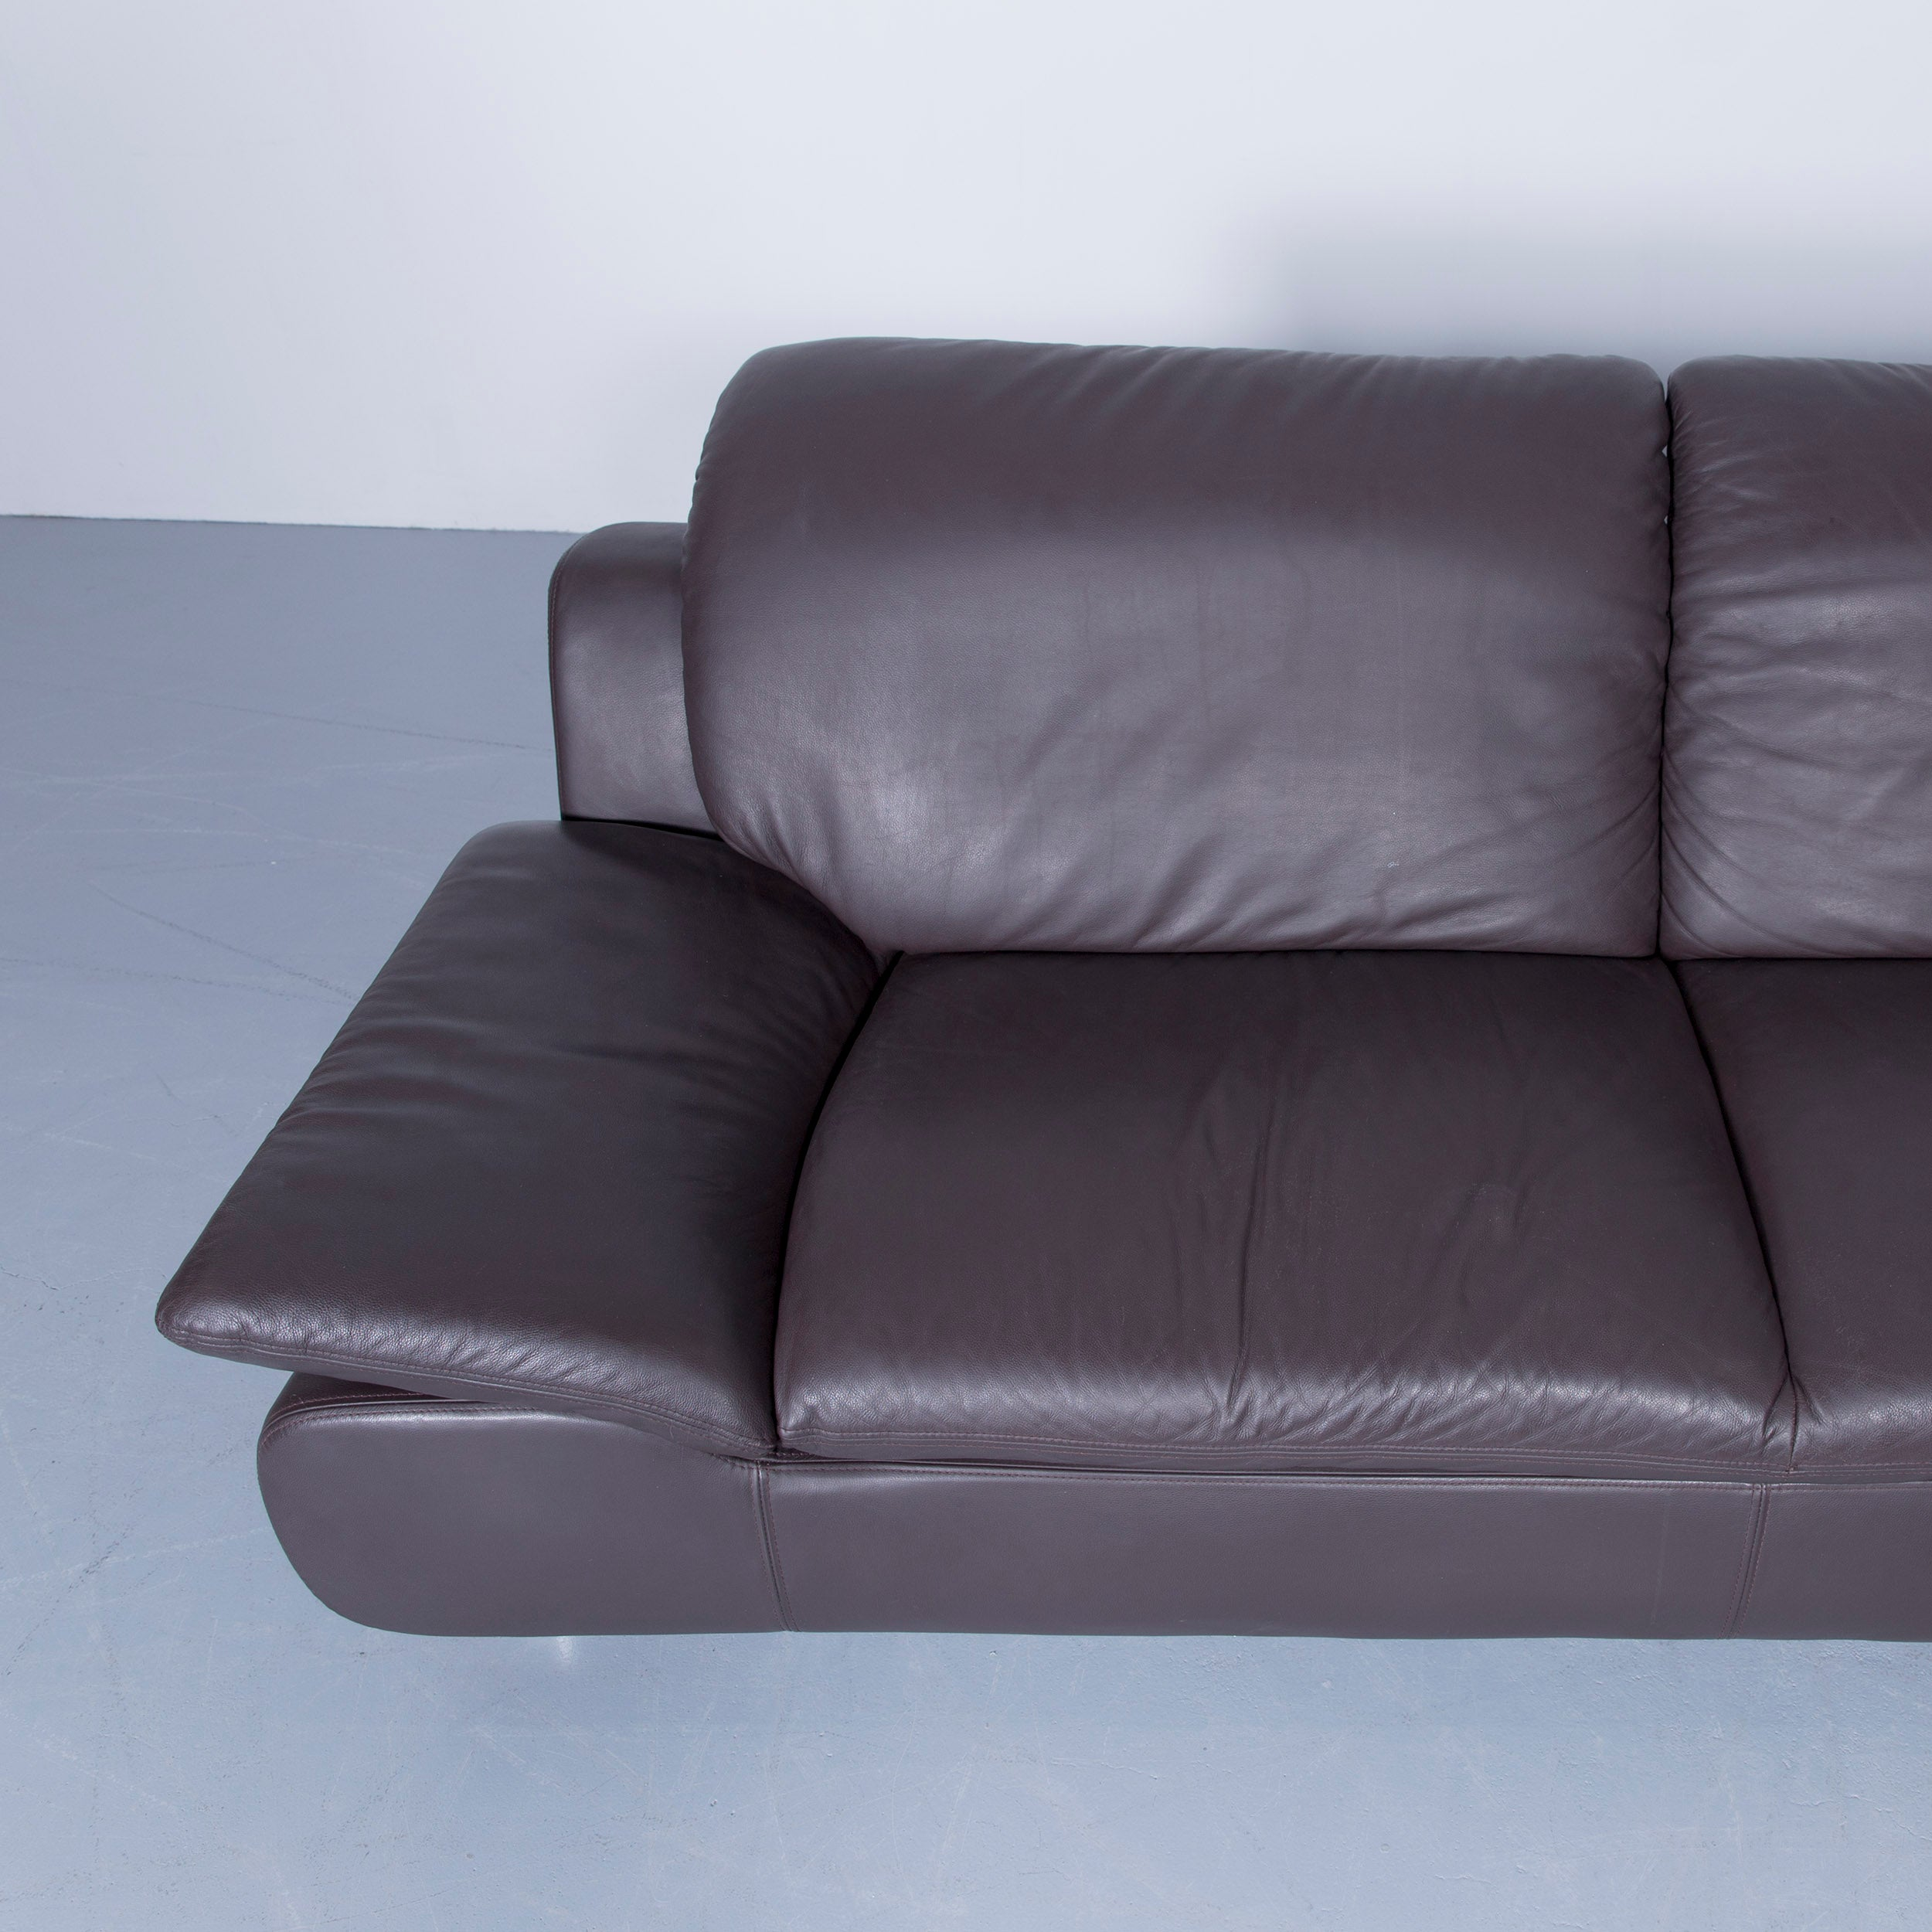 Liebenswert Couch Braun Leder Galerie Von Awesome Affordable Designer Leather Corner Sofa Set